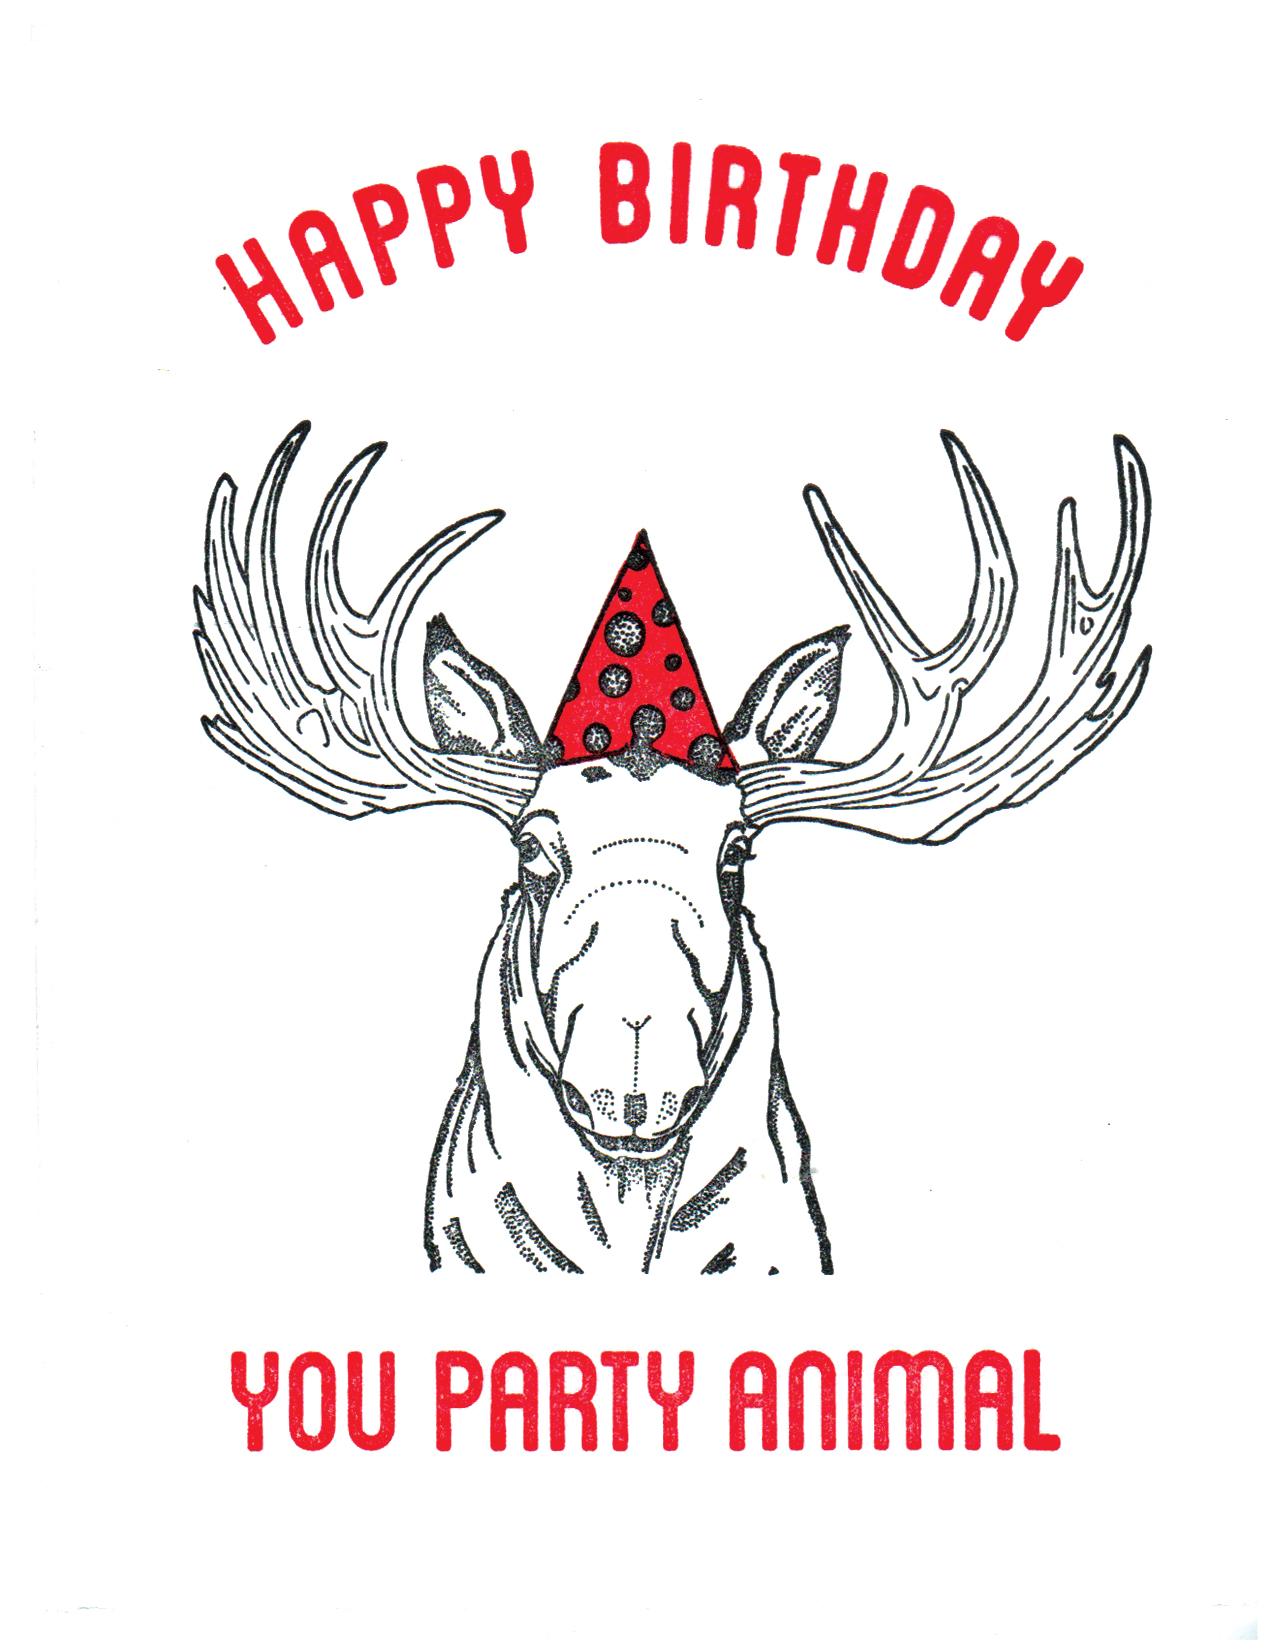 Party Animal - Moose Print